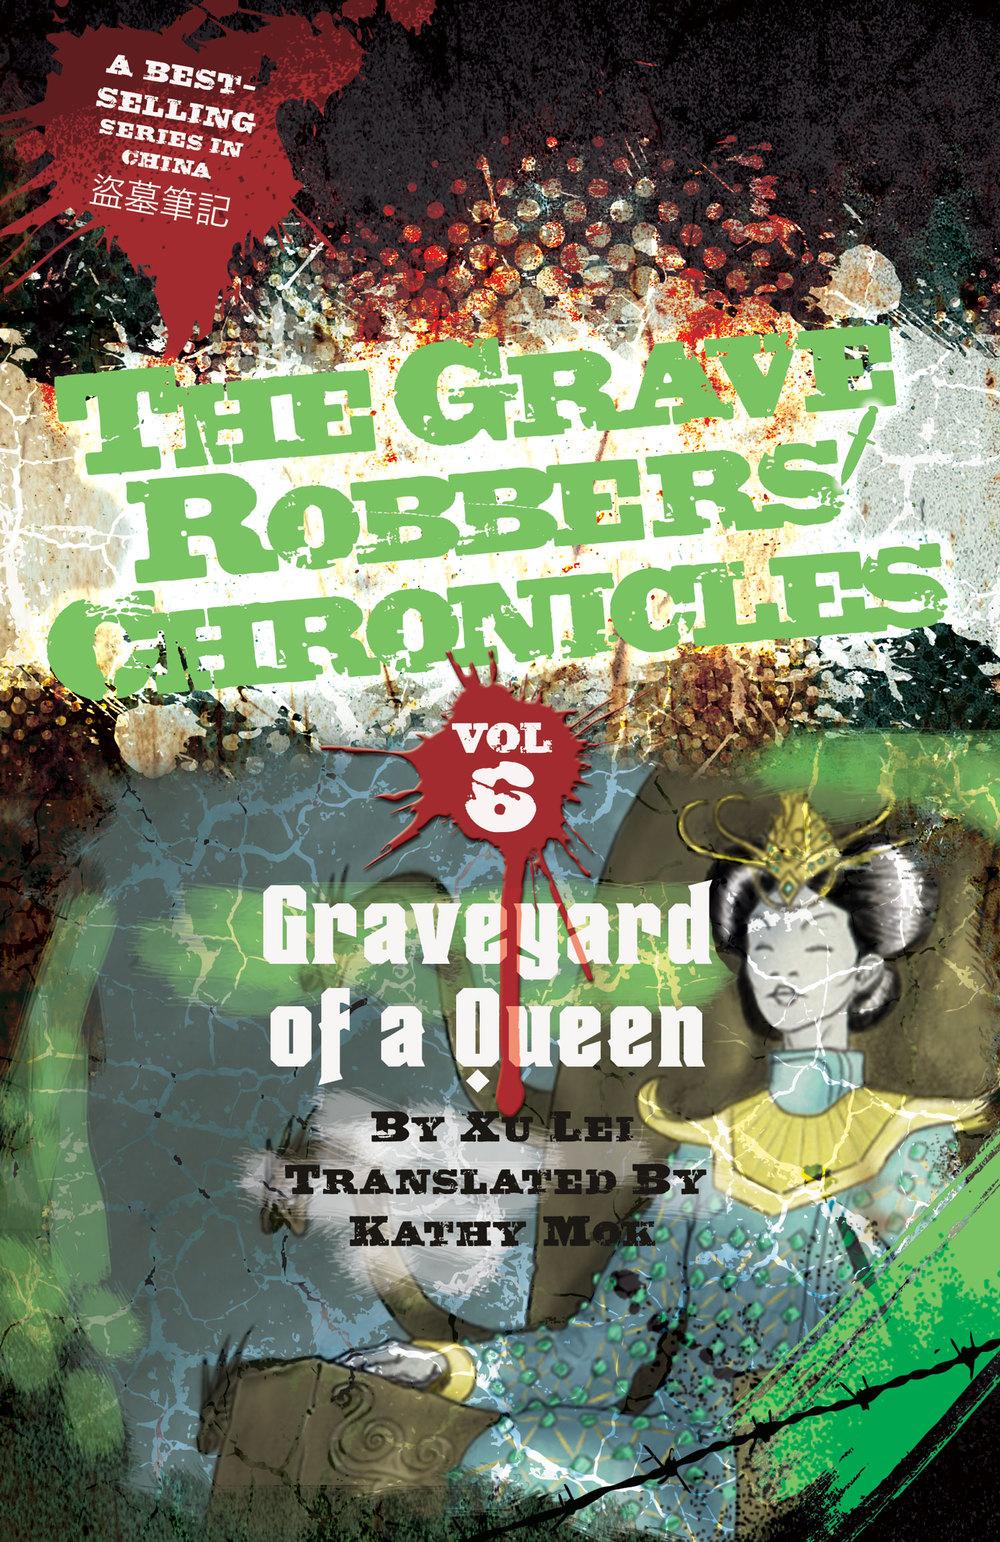 Vol. 6: Graveyard of a Queen